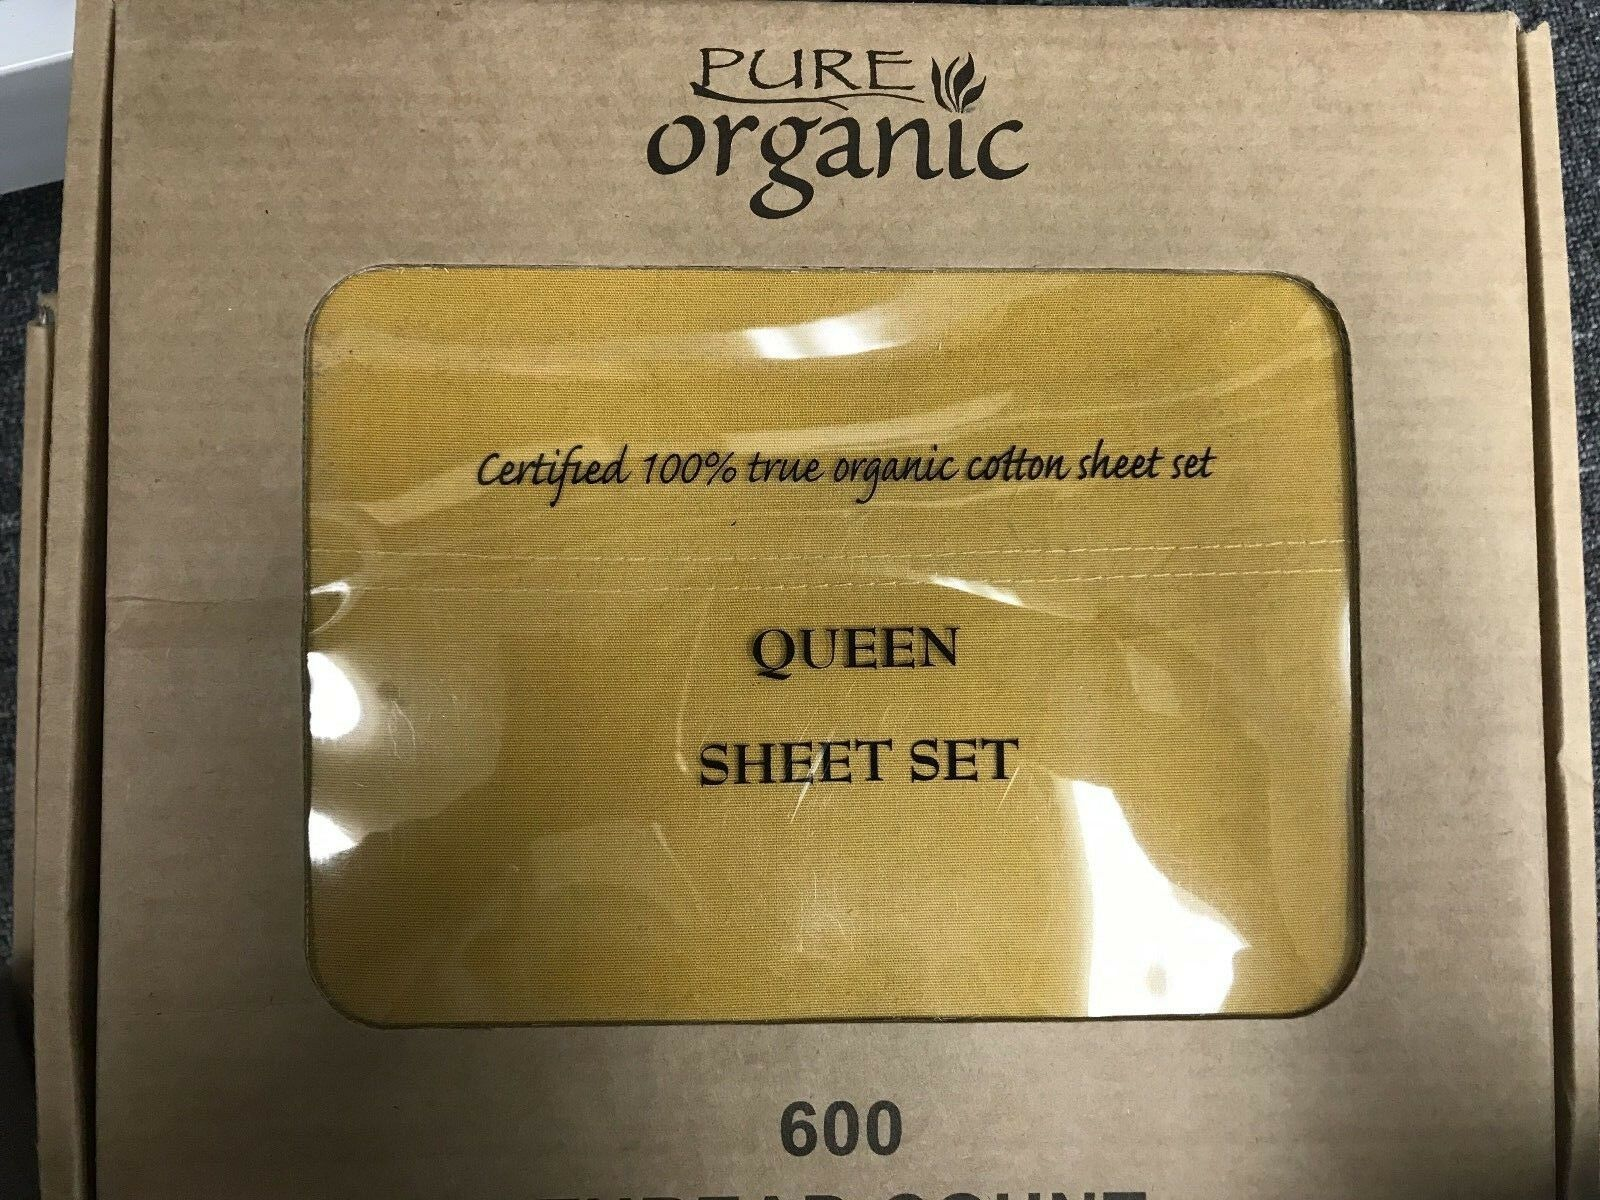 4pcs 100% Organic Cotton Bed Sheet Set 600 TC, Champagne gold Queen